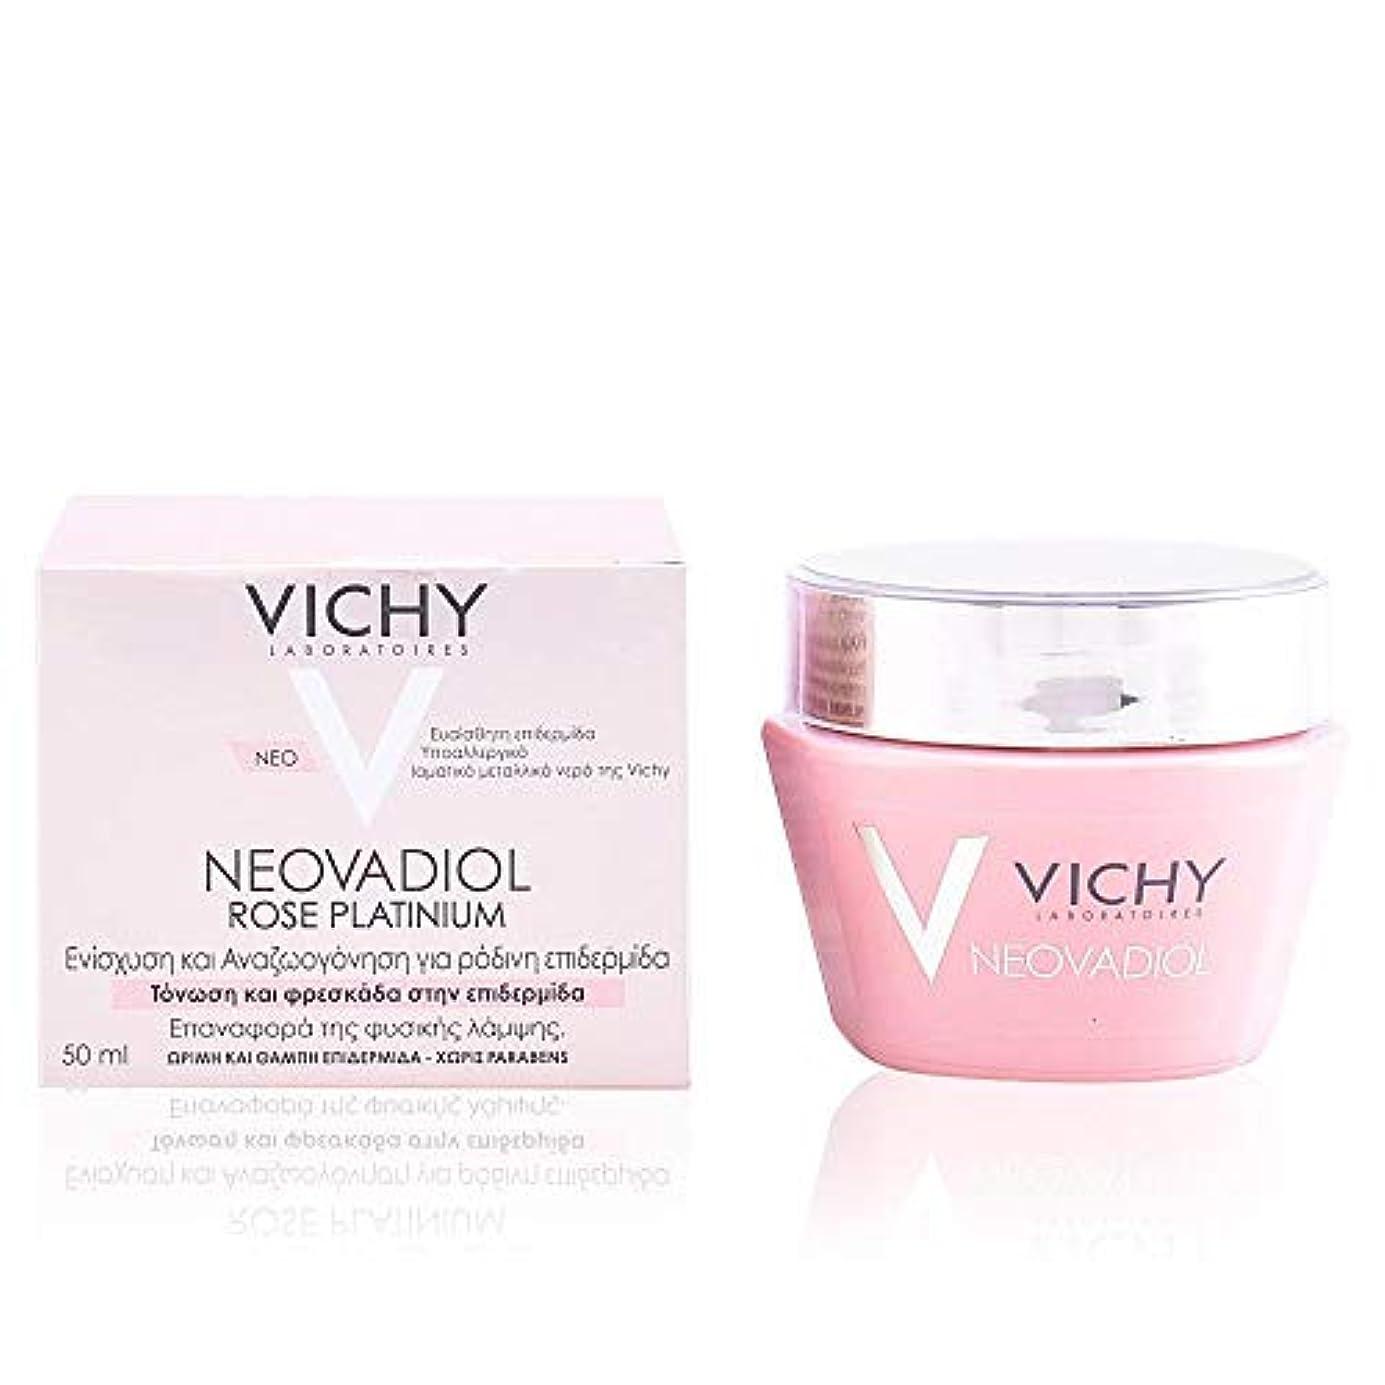 付き添い人結論所有者Vichy Neovadiol Rose Platinium Cream 50ml [並行輸入品]